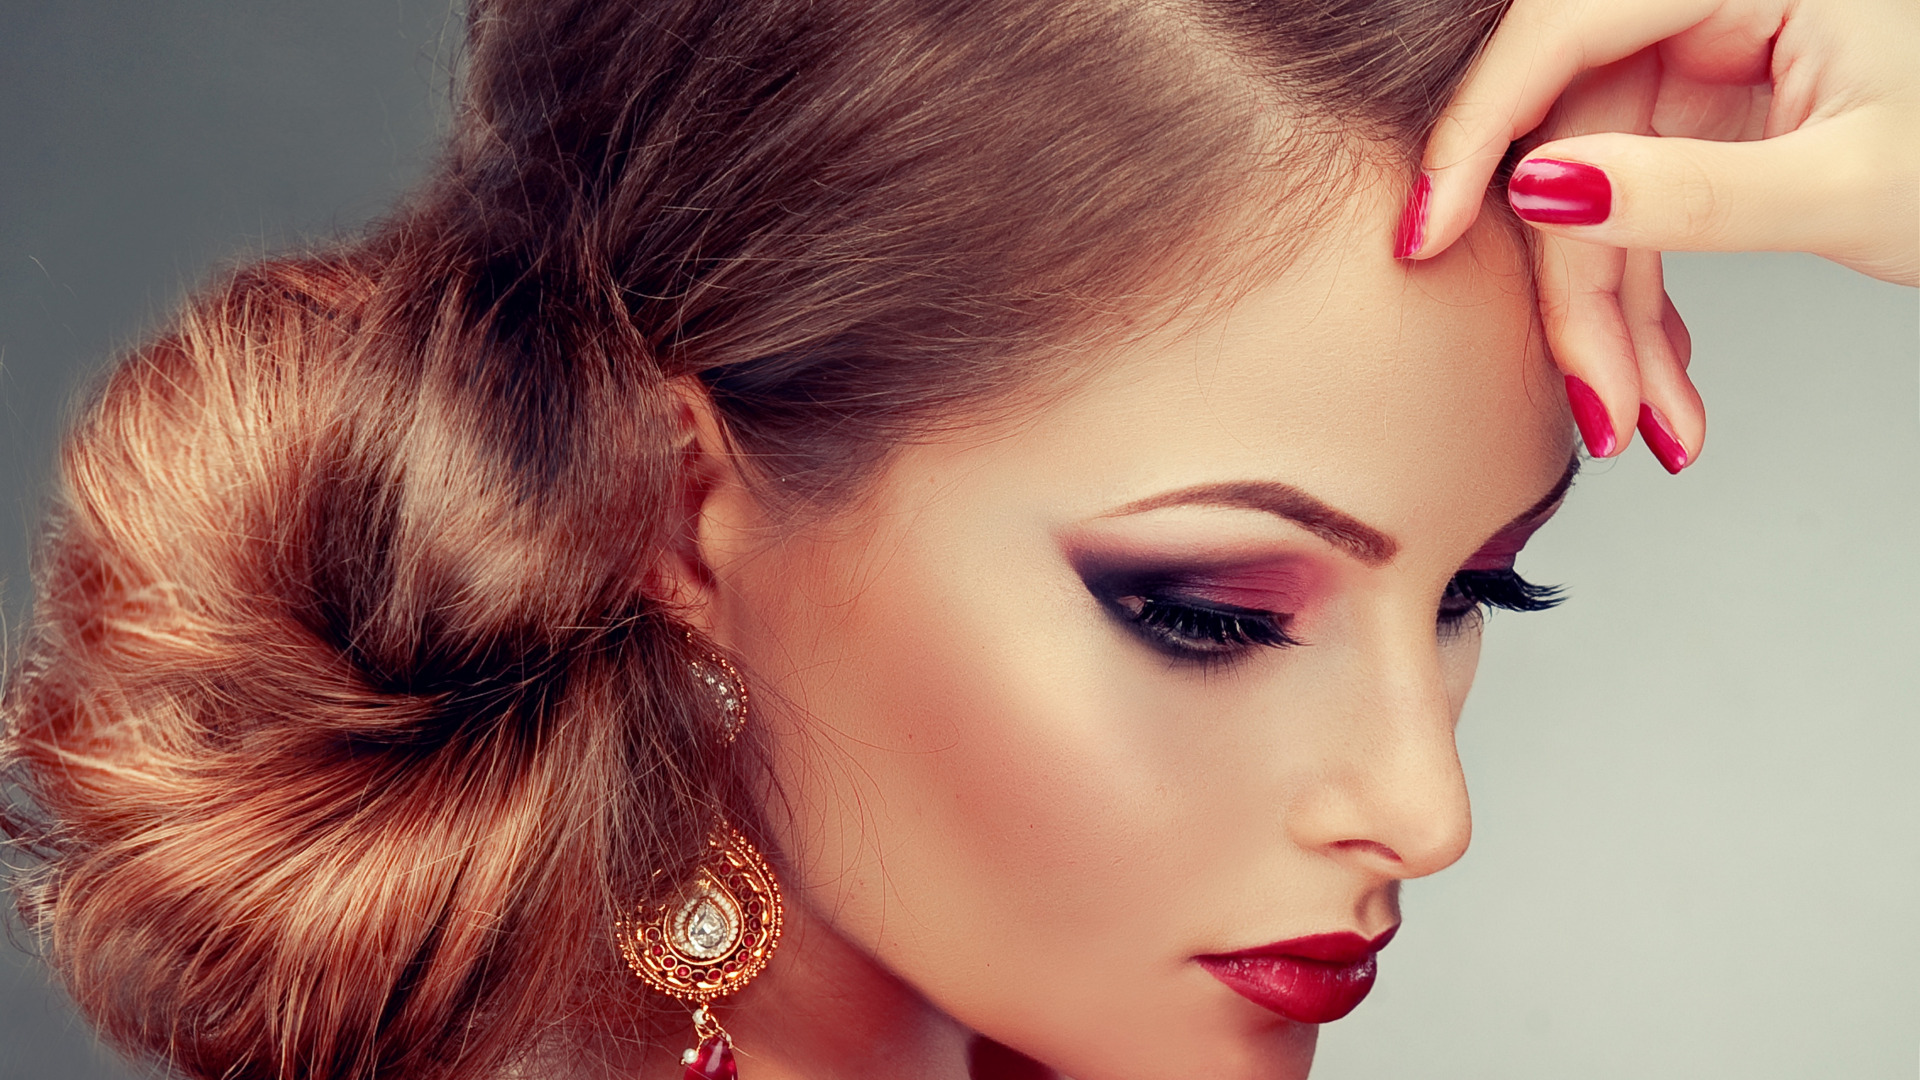 Прически и макияж к моему лицу по фото